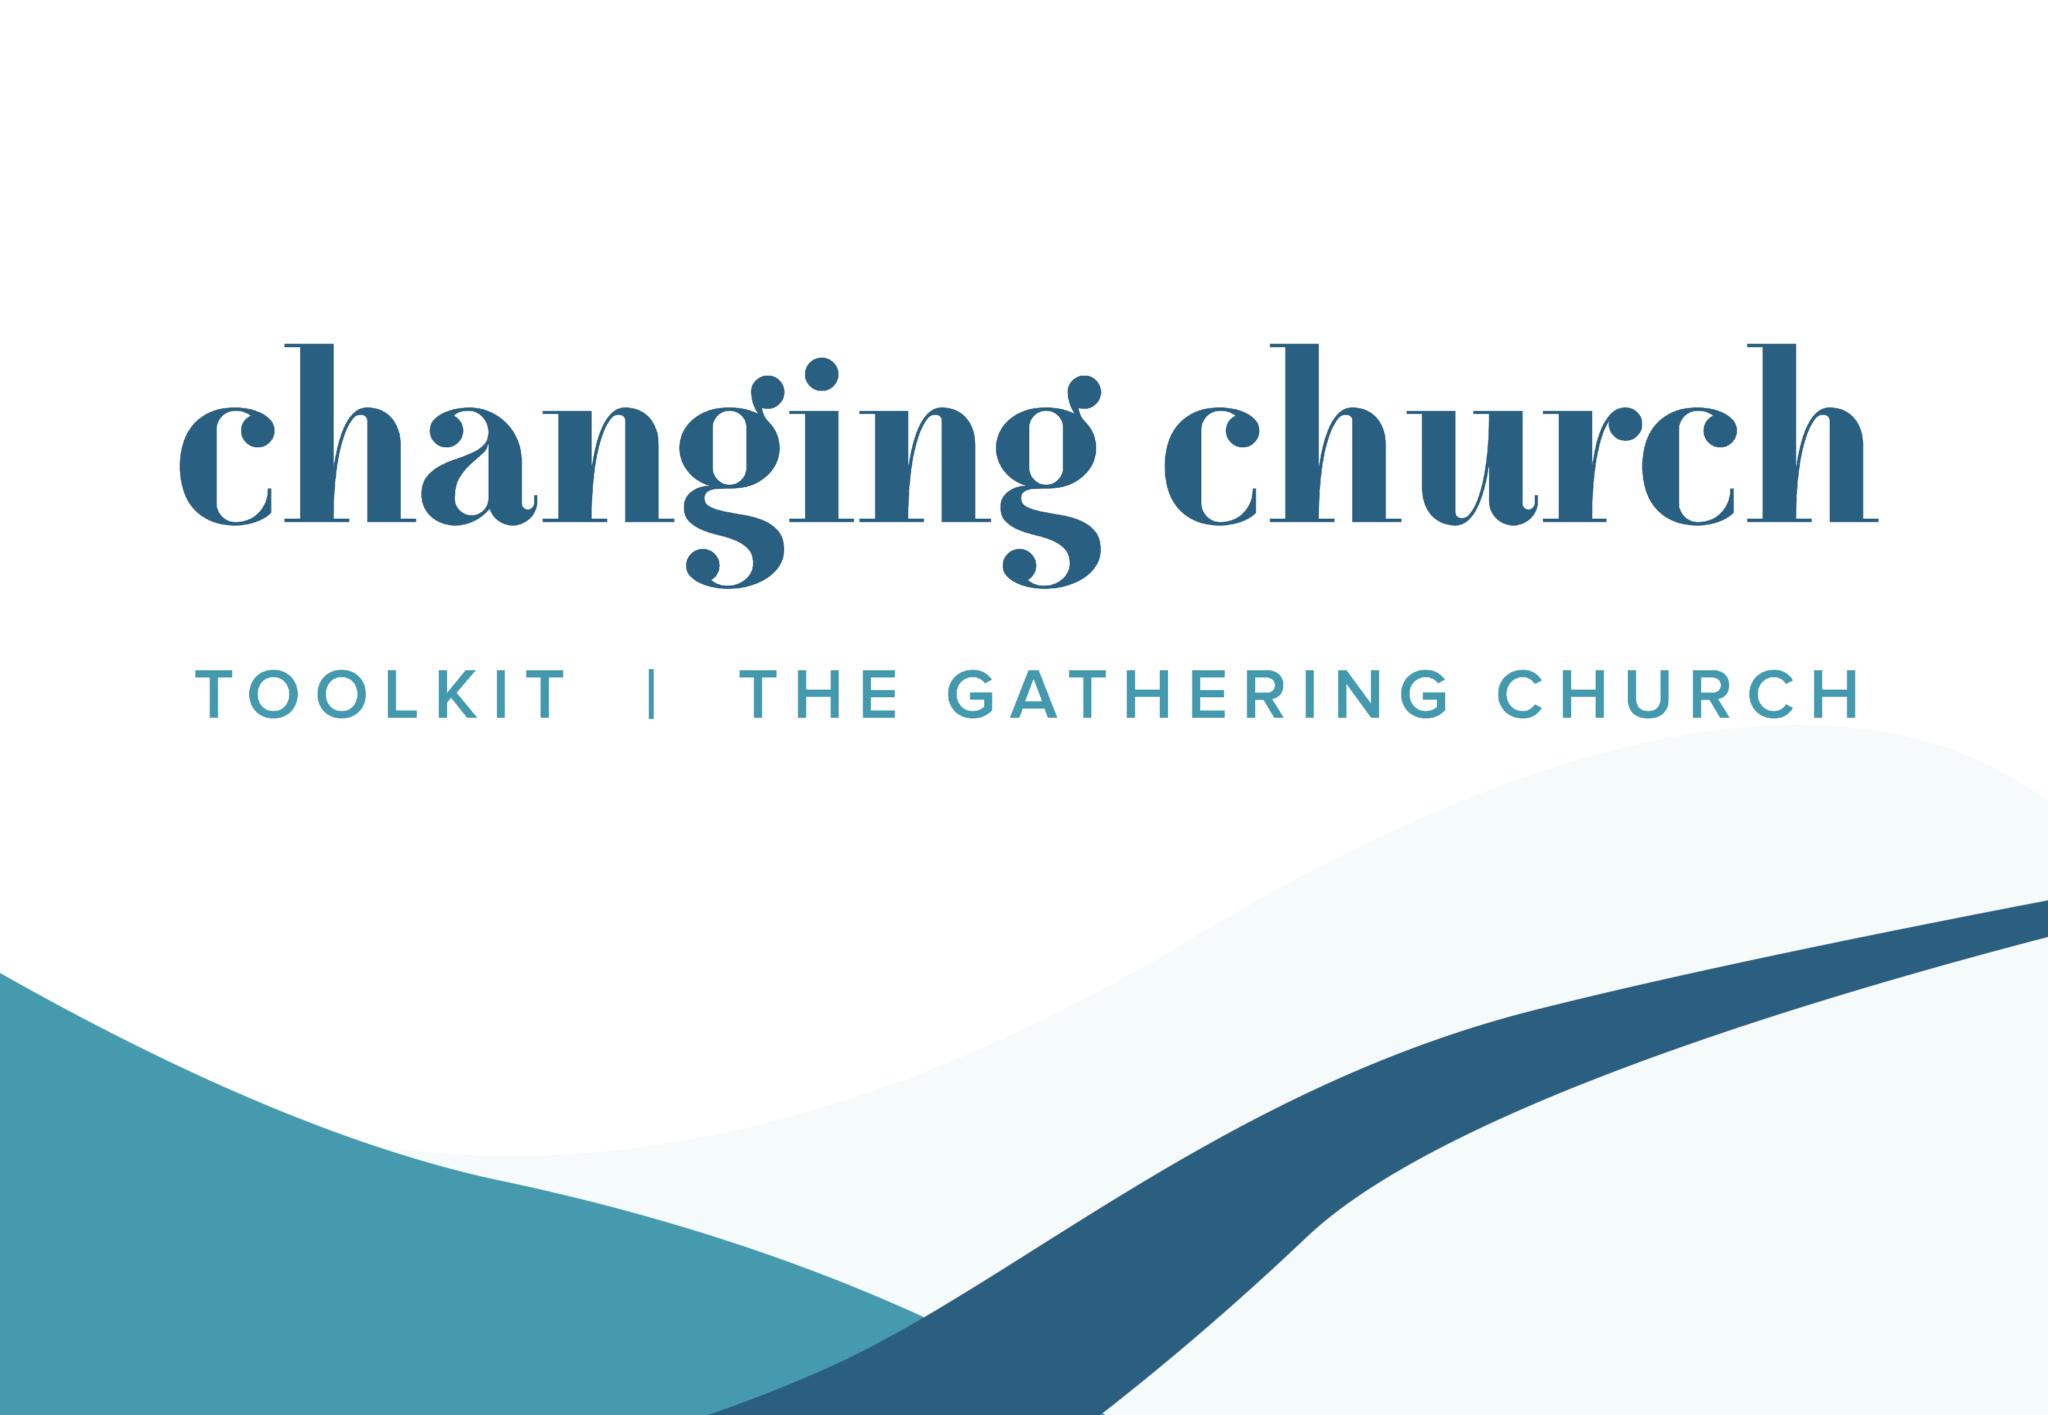 Changing Church Toolkit Gathering church